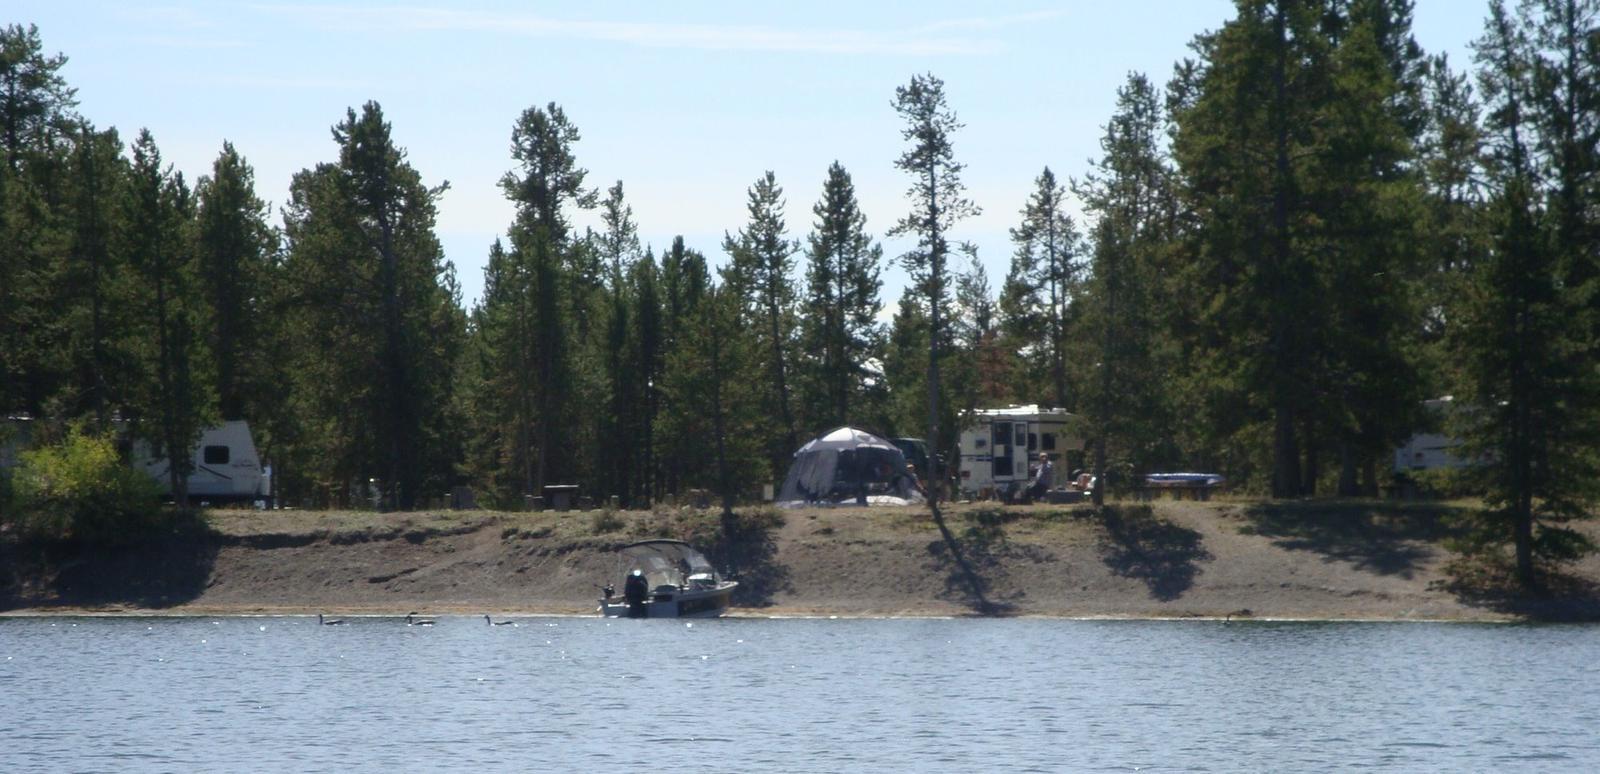 View of Lonesomehurst Campground from Hebgen Lake, boat, RV, tent  & pine treesLonesomehurst Campground